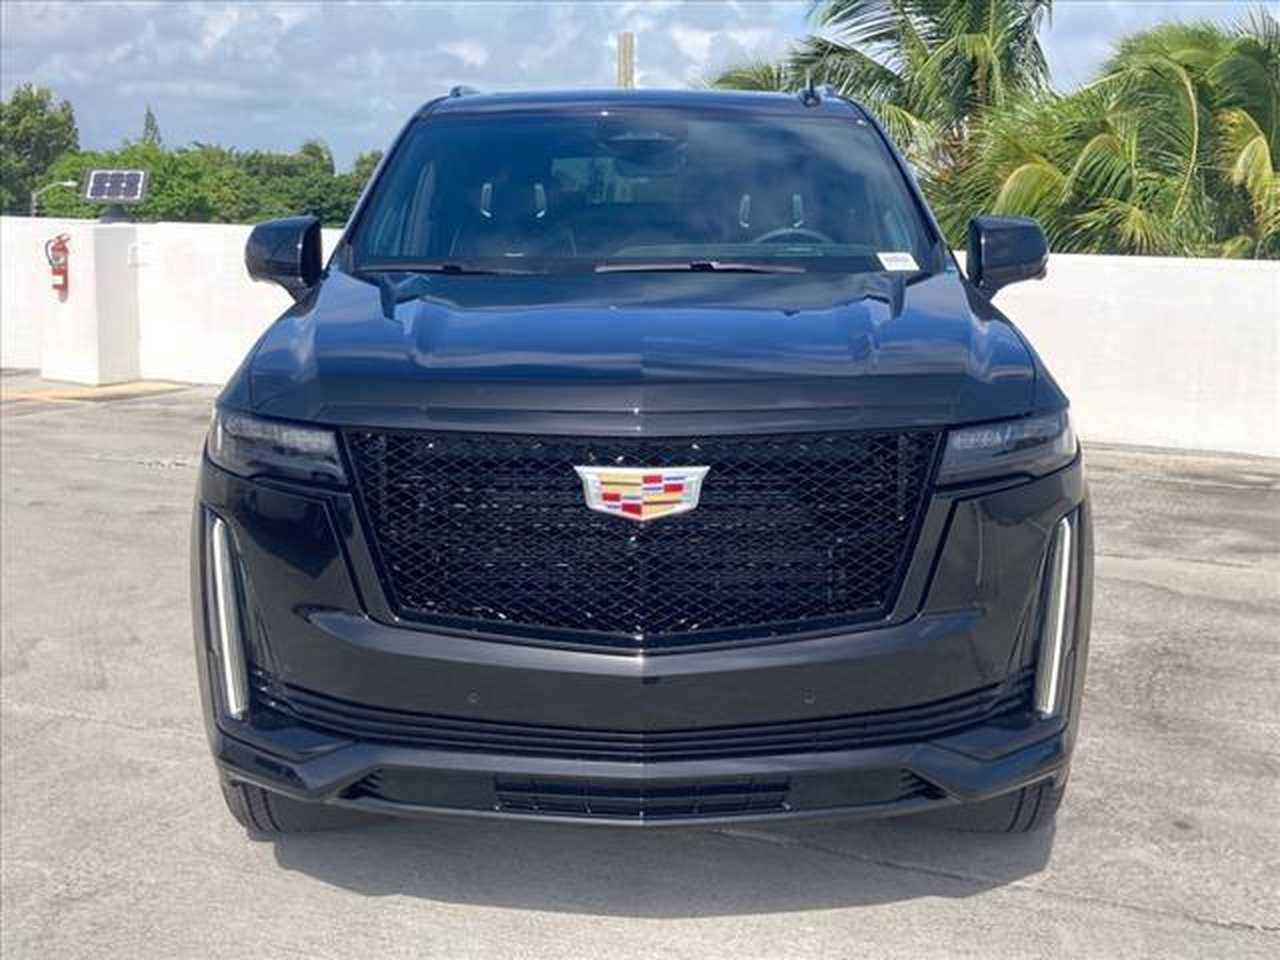 Cadillac Escalade ESV 2021 Cadillac Escalade ESV Sport Platinum   - Foto 1